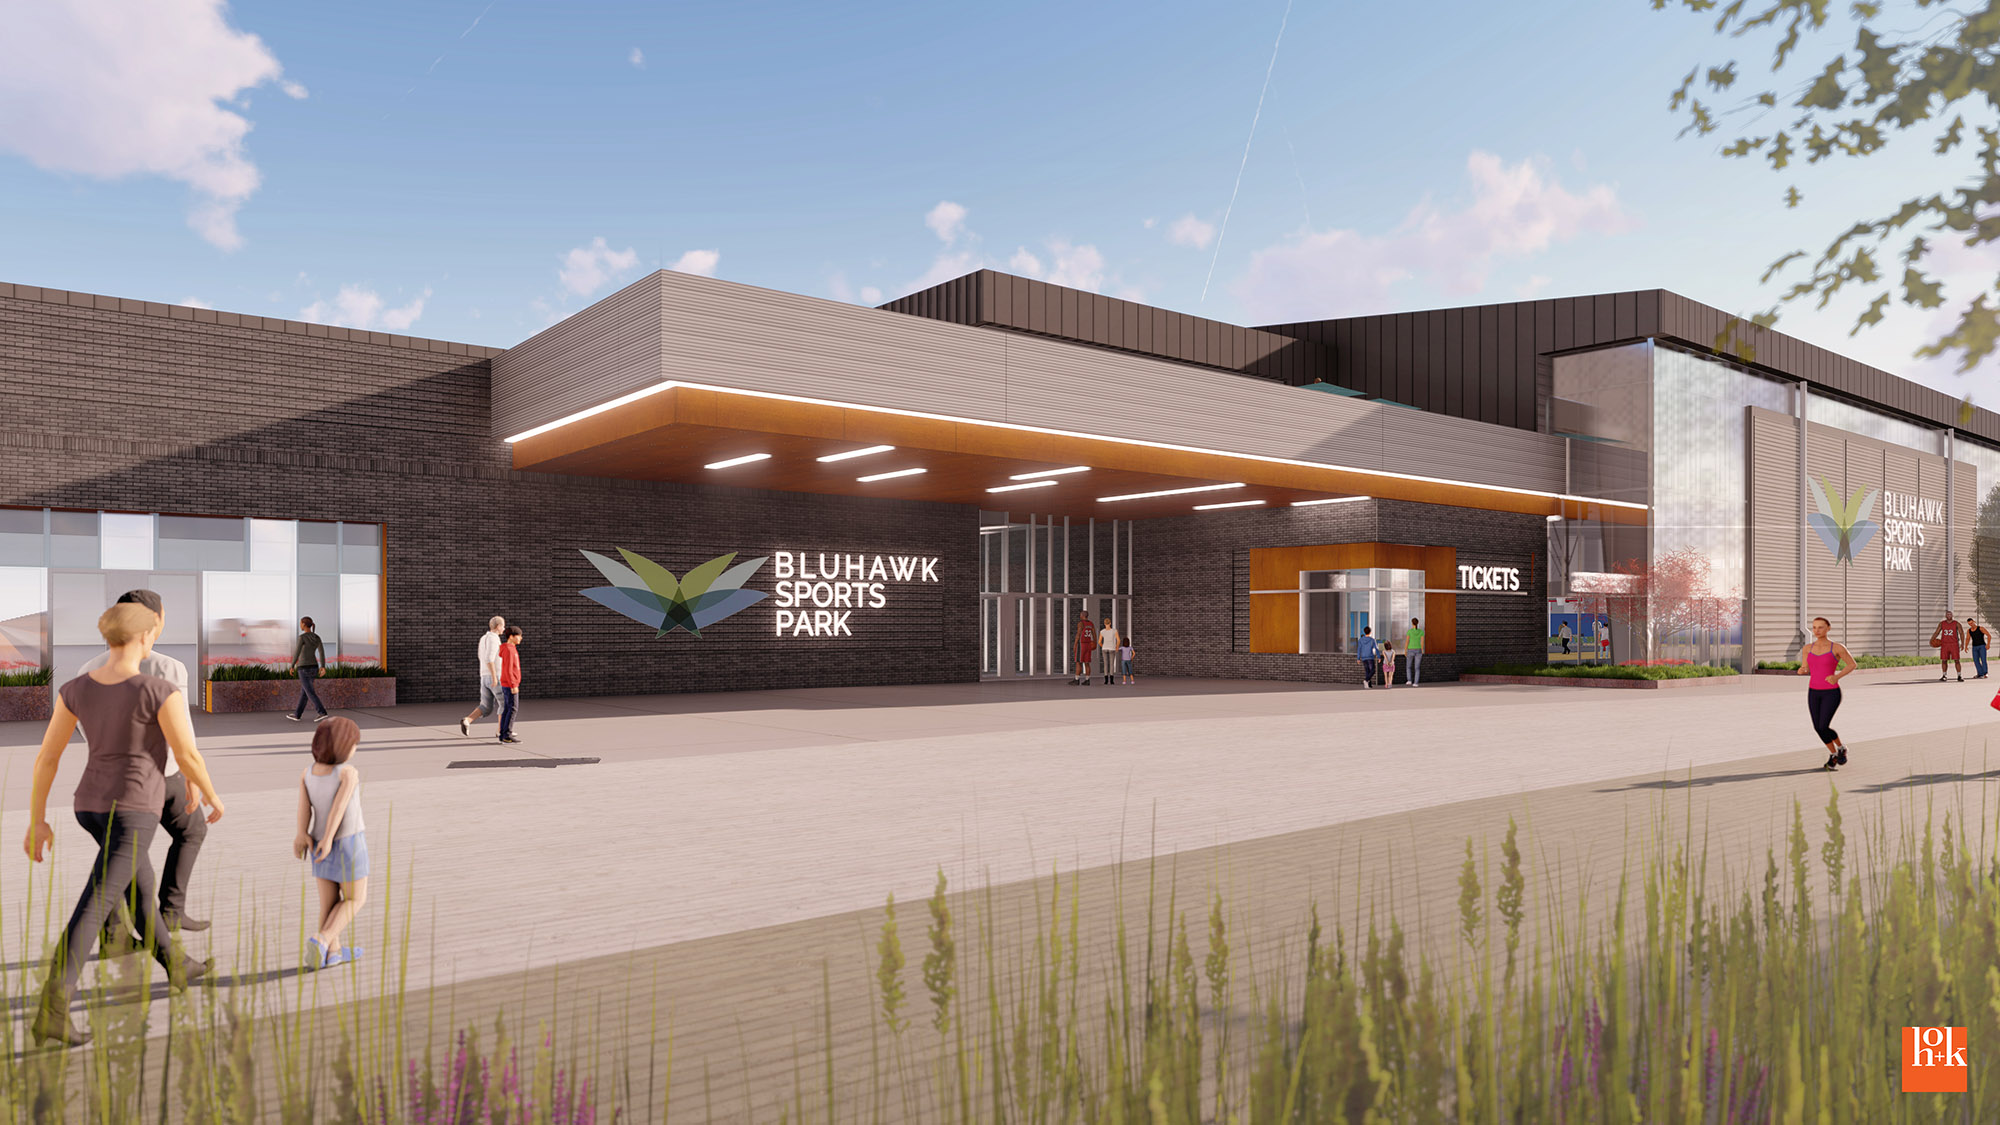 Bluhawk Sports Park